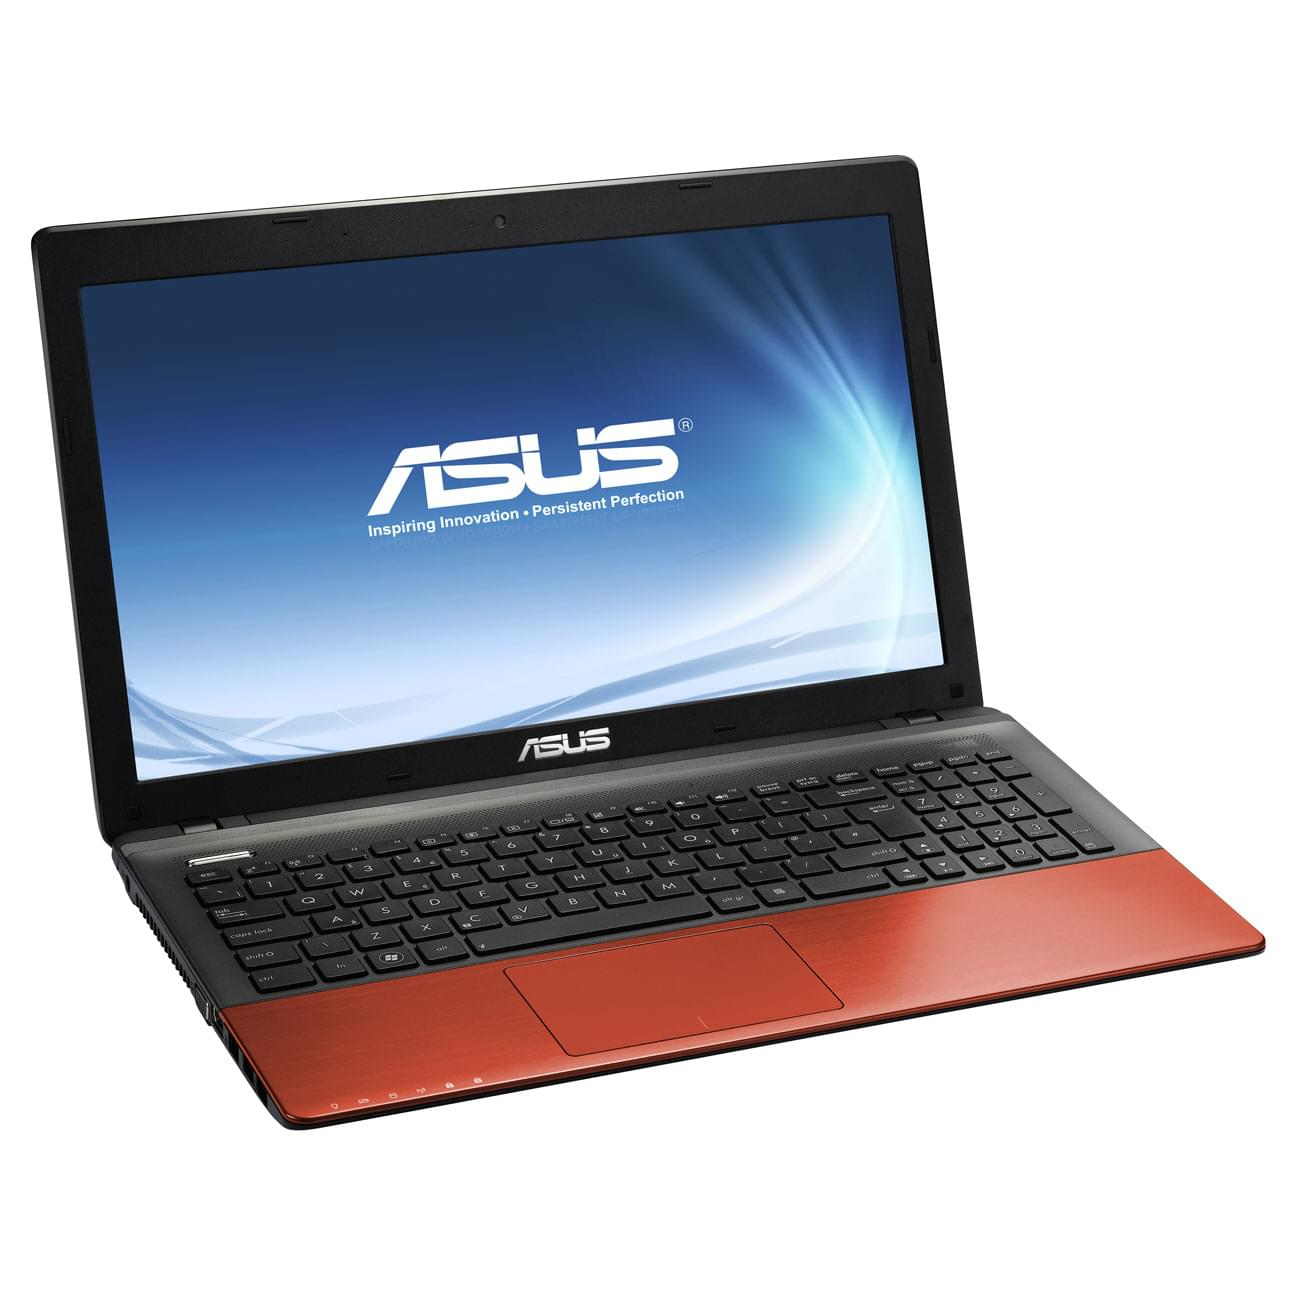 Asus K55VD-SX203V - PC portable Asus - Cybertek.fr - 0